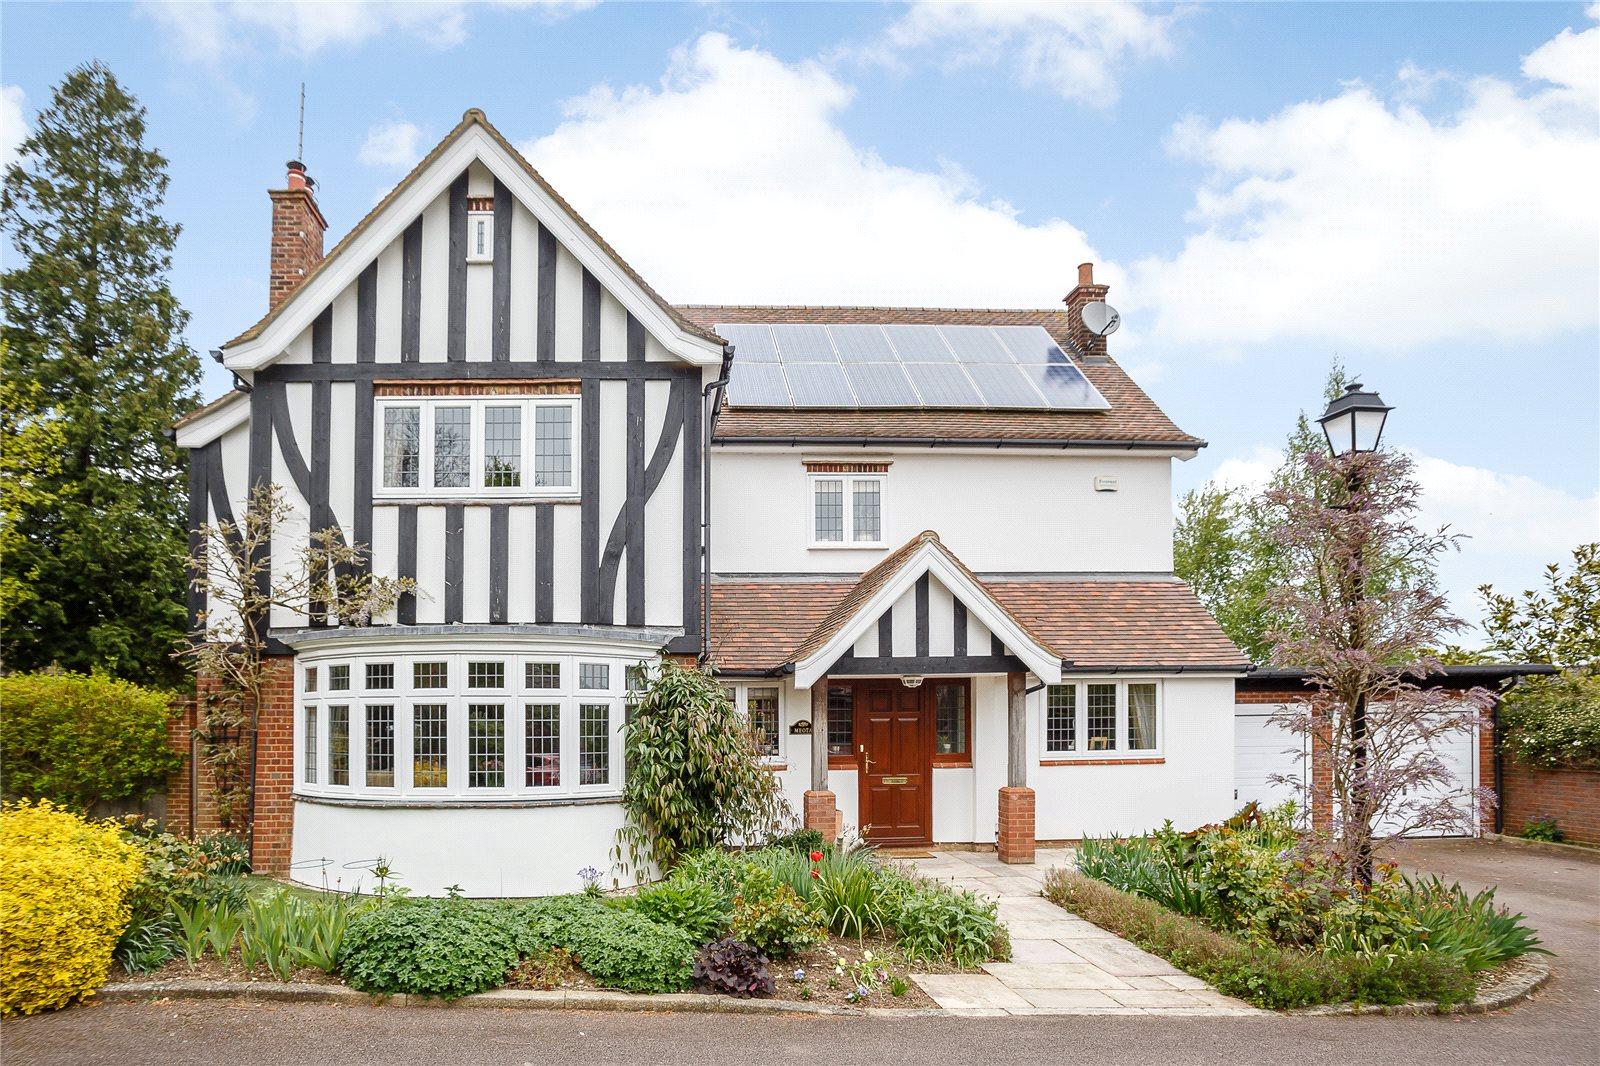 Maison unifamiliale pour l Vente à The Bourne, Salisbury Avenue, Harpenden, Hertfordshire, AL5 Harpenden, Angleterre